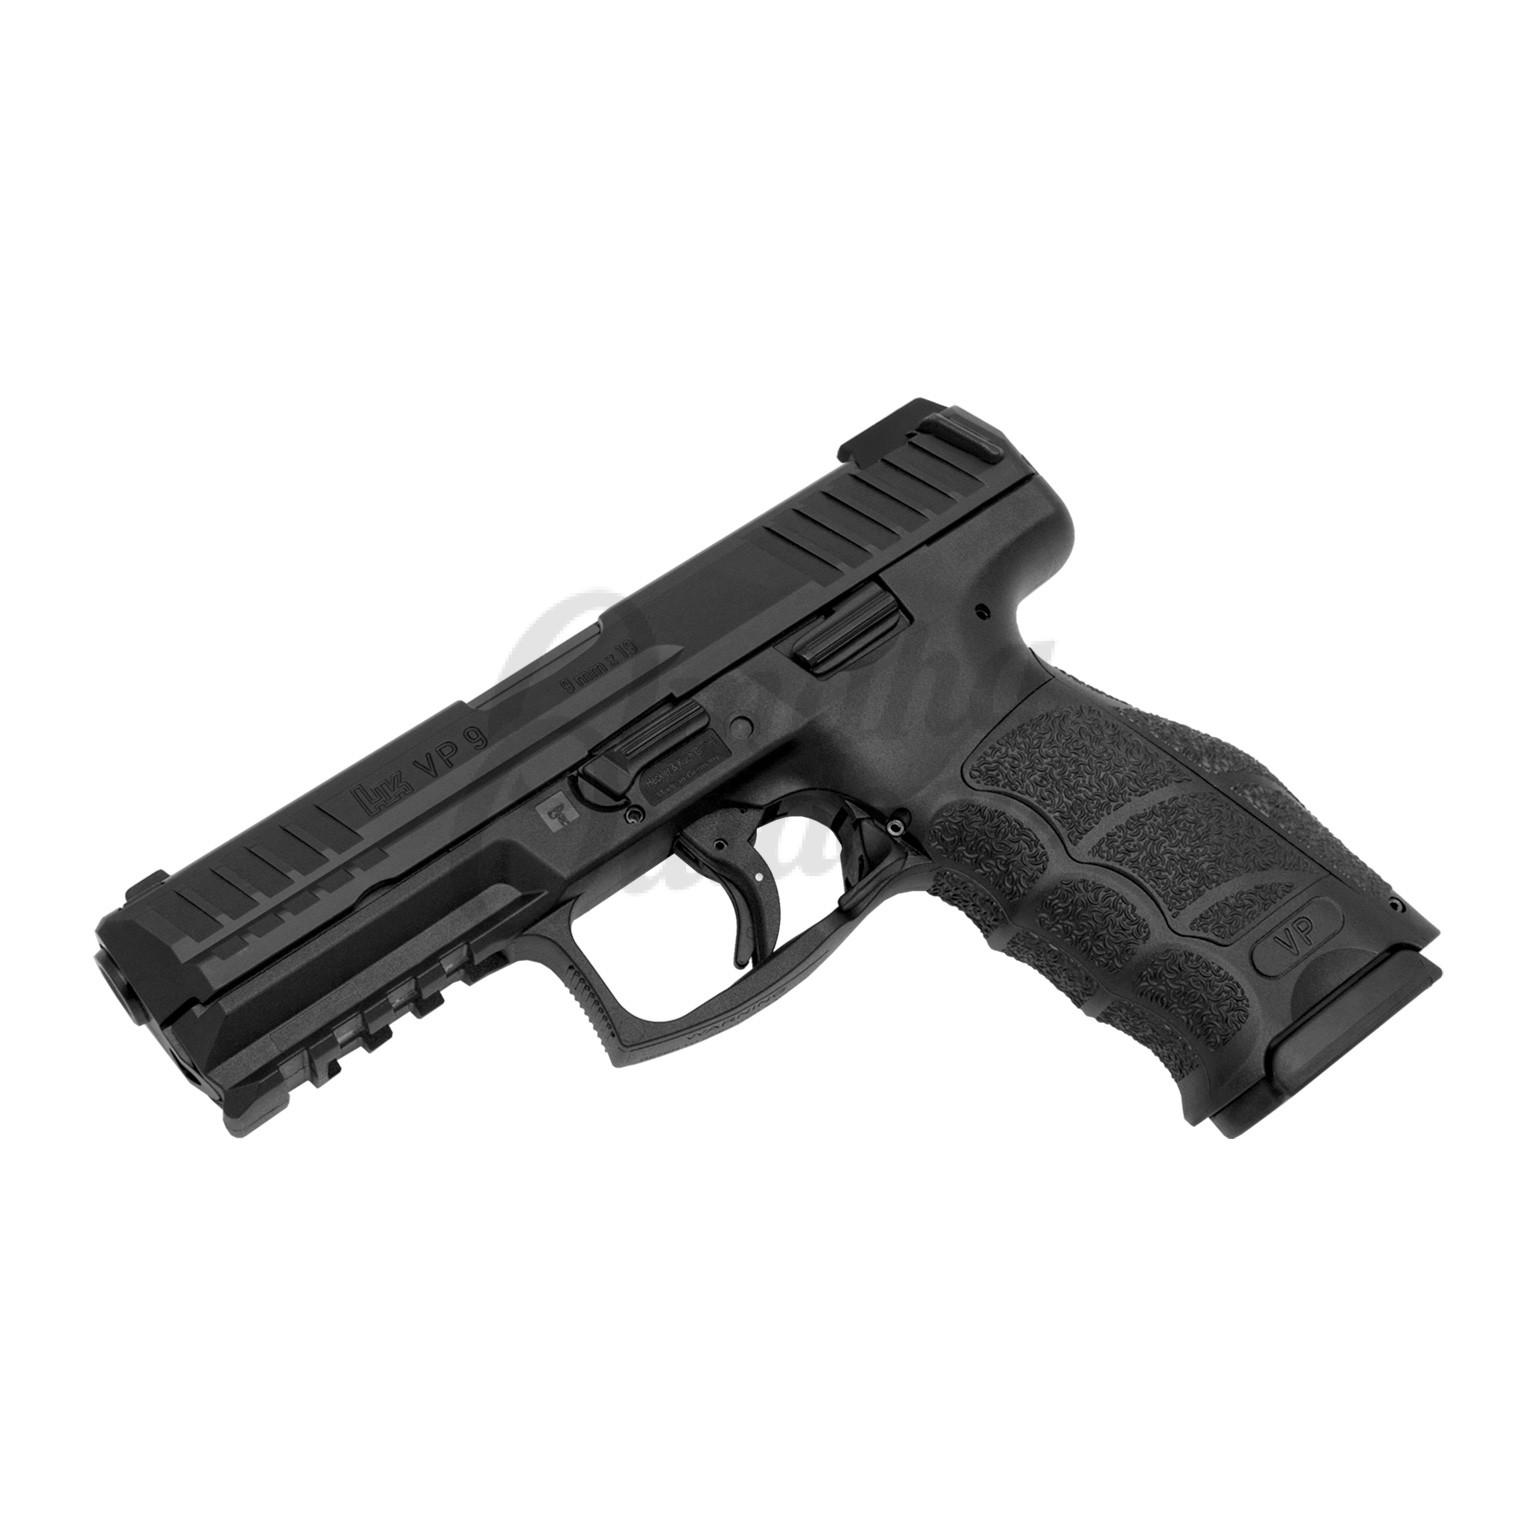 H&K VP9 LE Pistol 10 RD 9mm Night Sights 700009LEL-A5